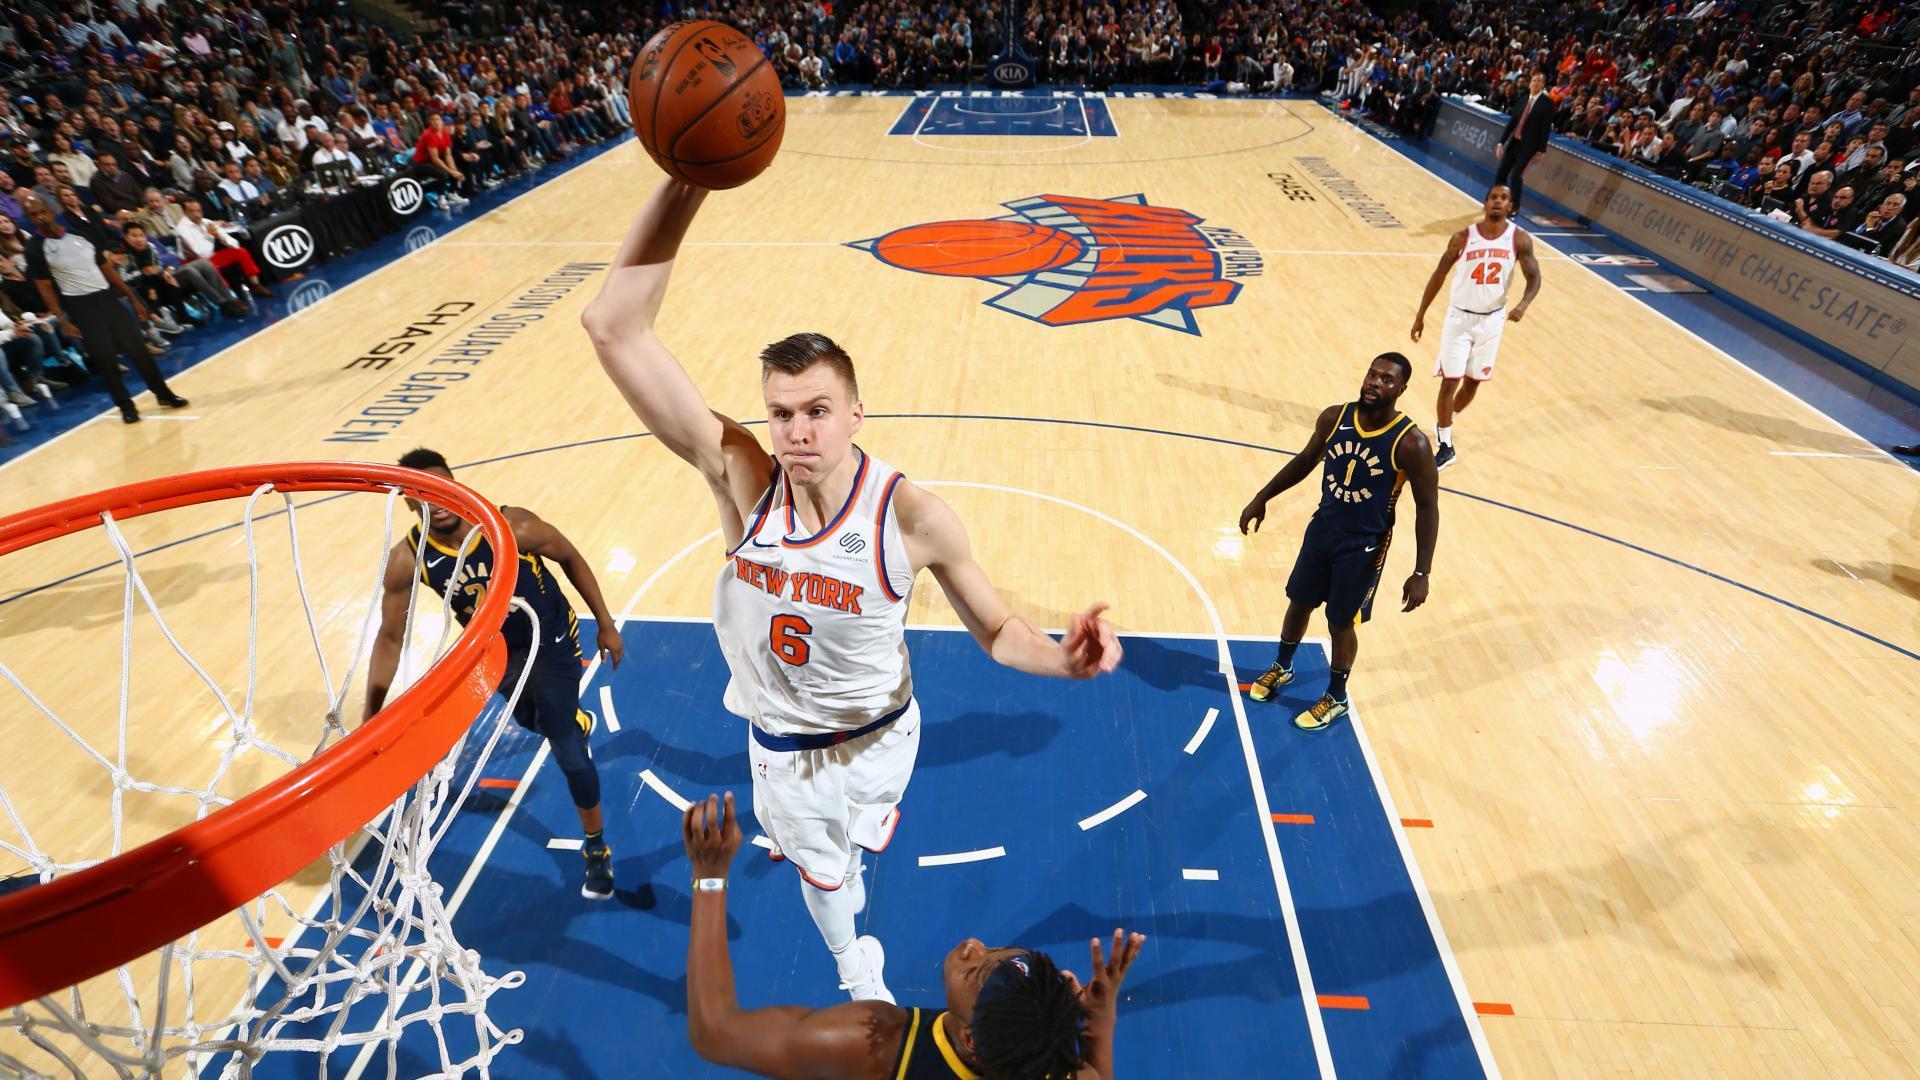 Kristaps Porzingis off to historic start for New York Knicks NBAcom 1920x1080